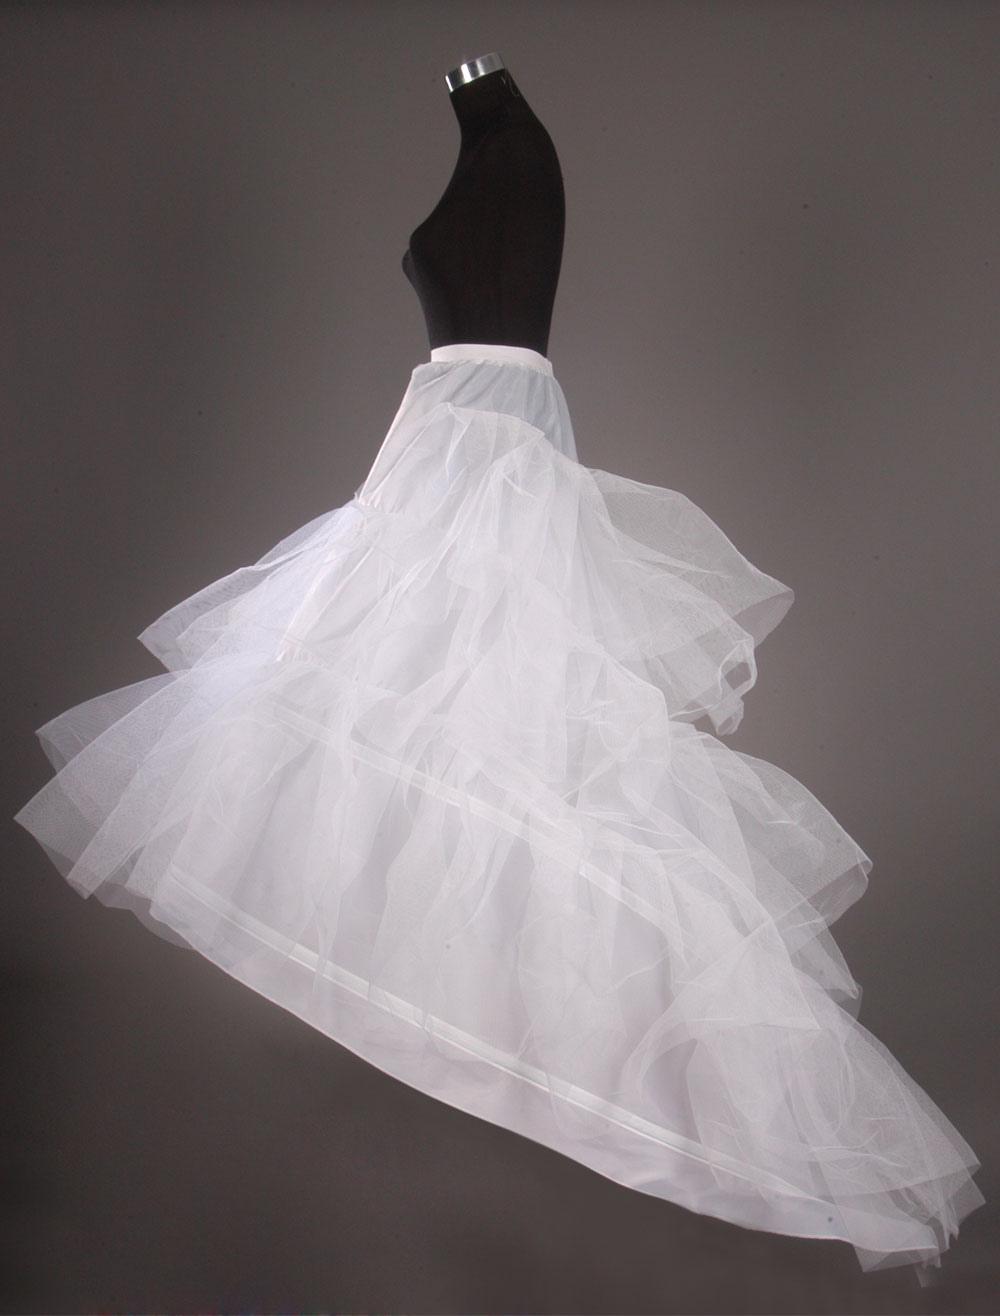 Layered Two-Tier Net Fashion Chapel Train Wedding Petticoat